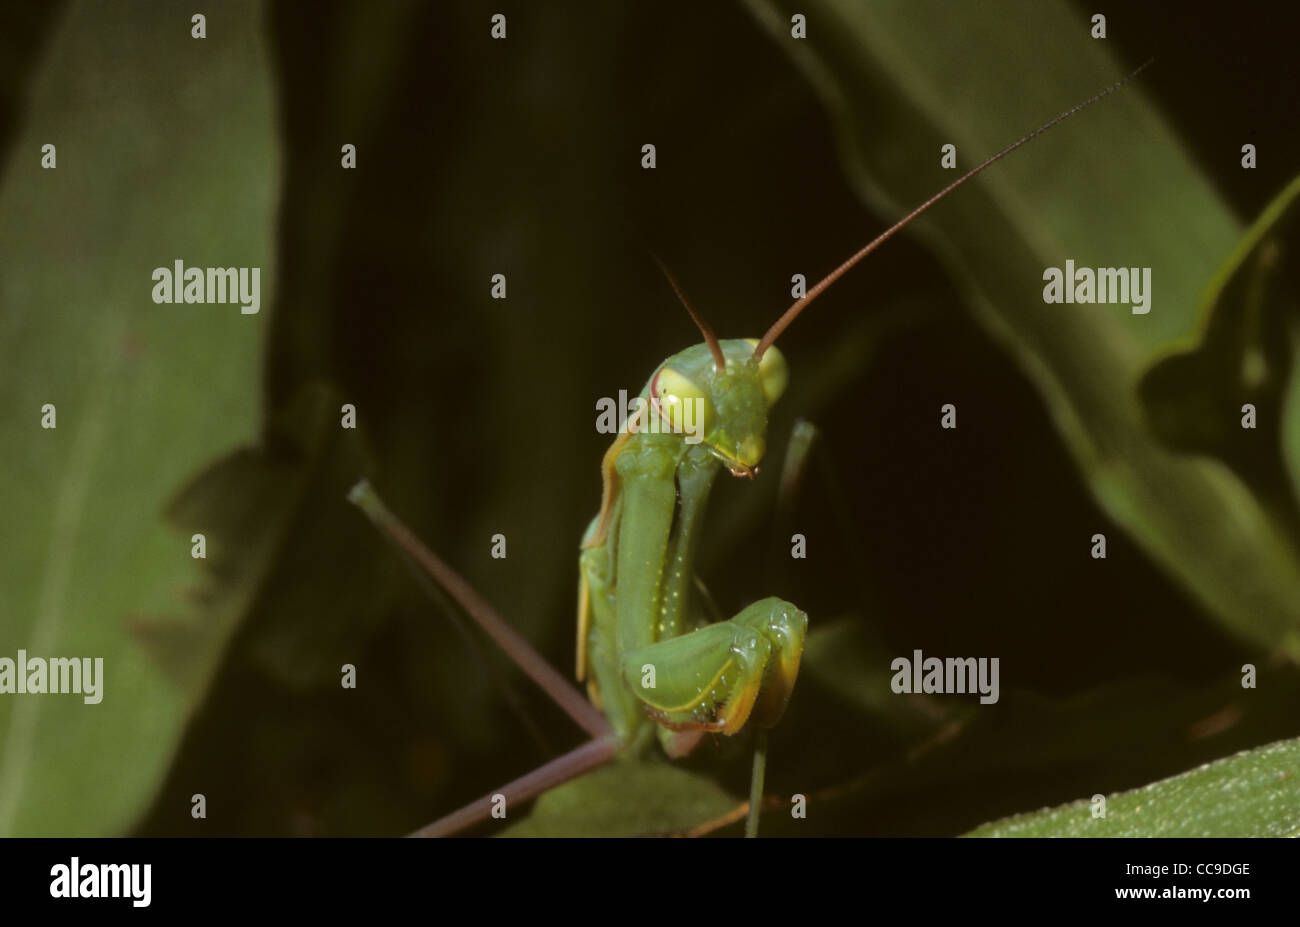 Preying Mantis. France - Stock Image